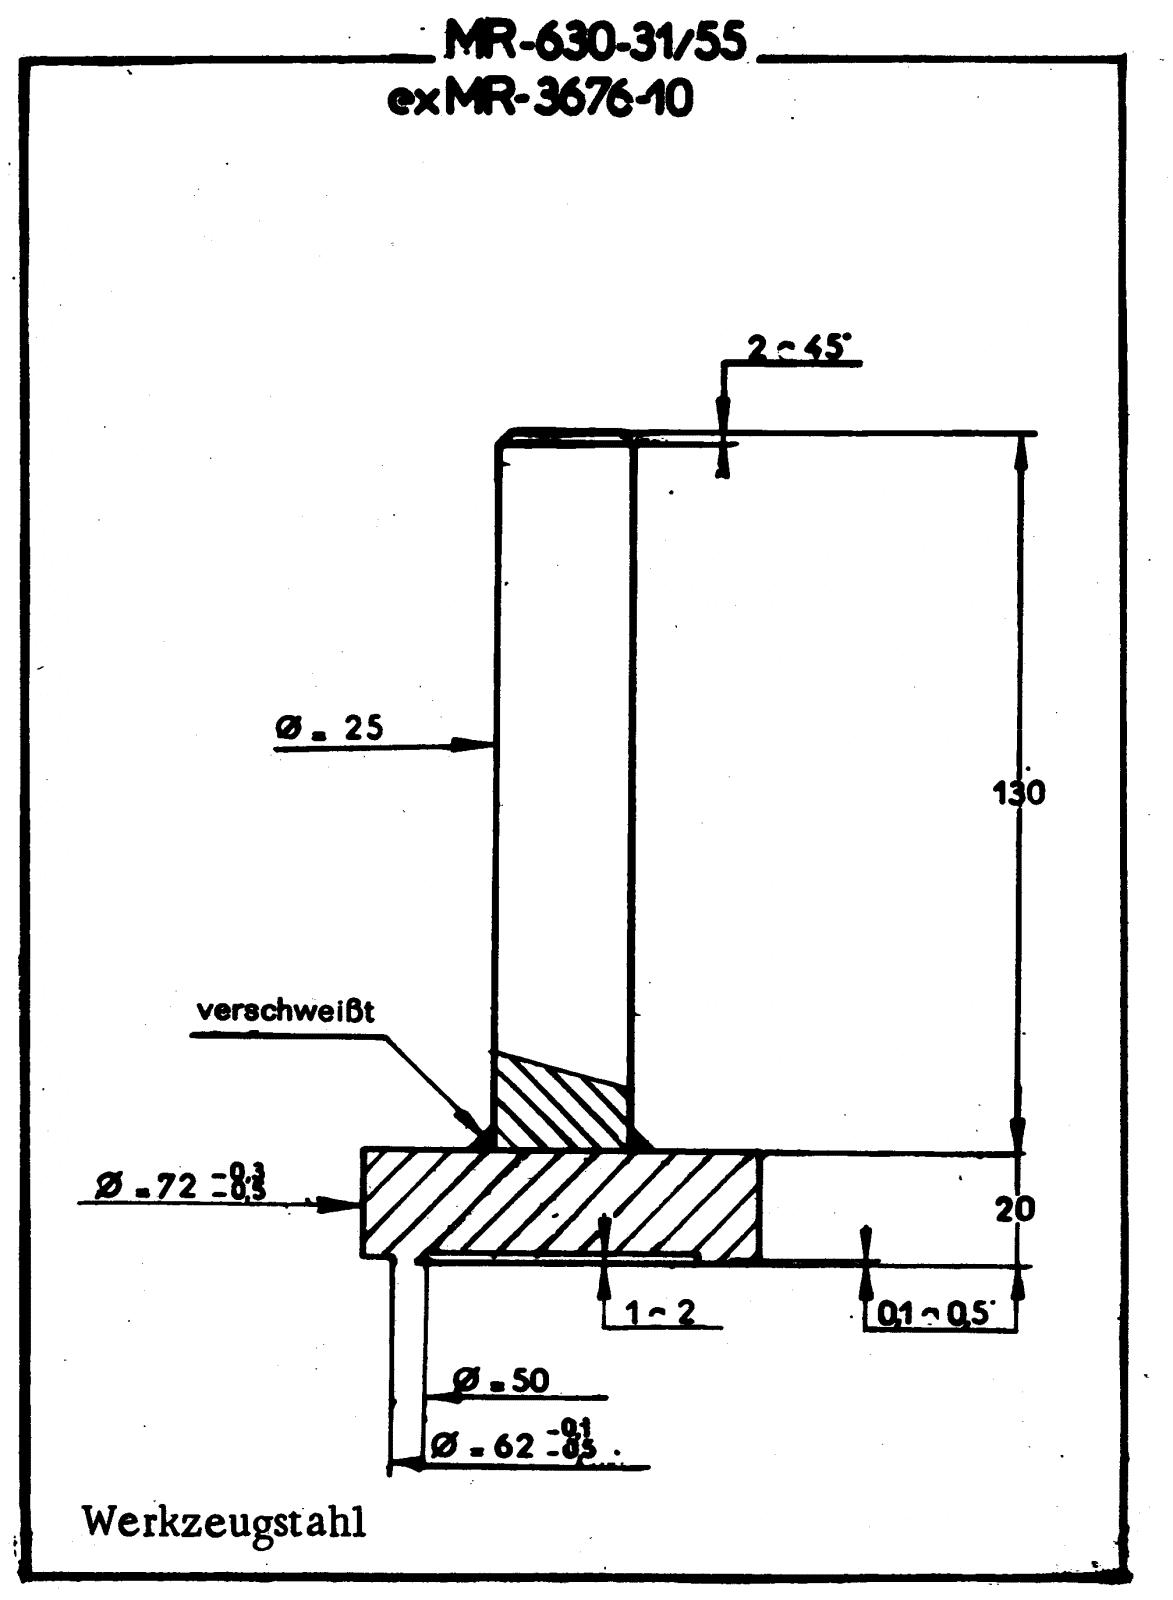 MR-630-31-55-seal-inst copie.png